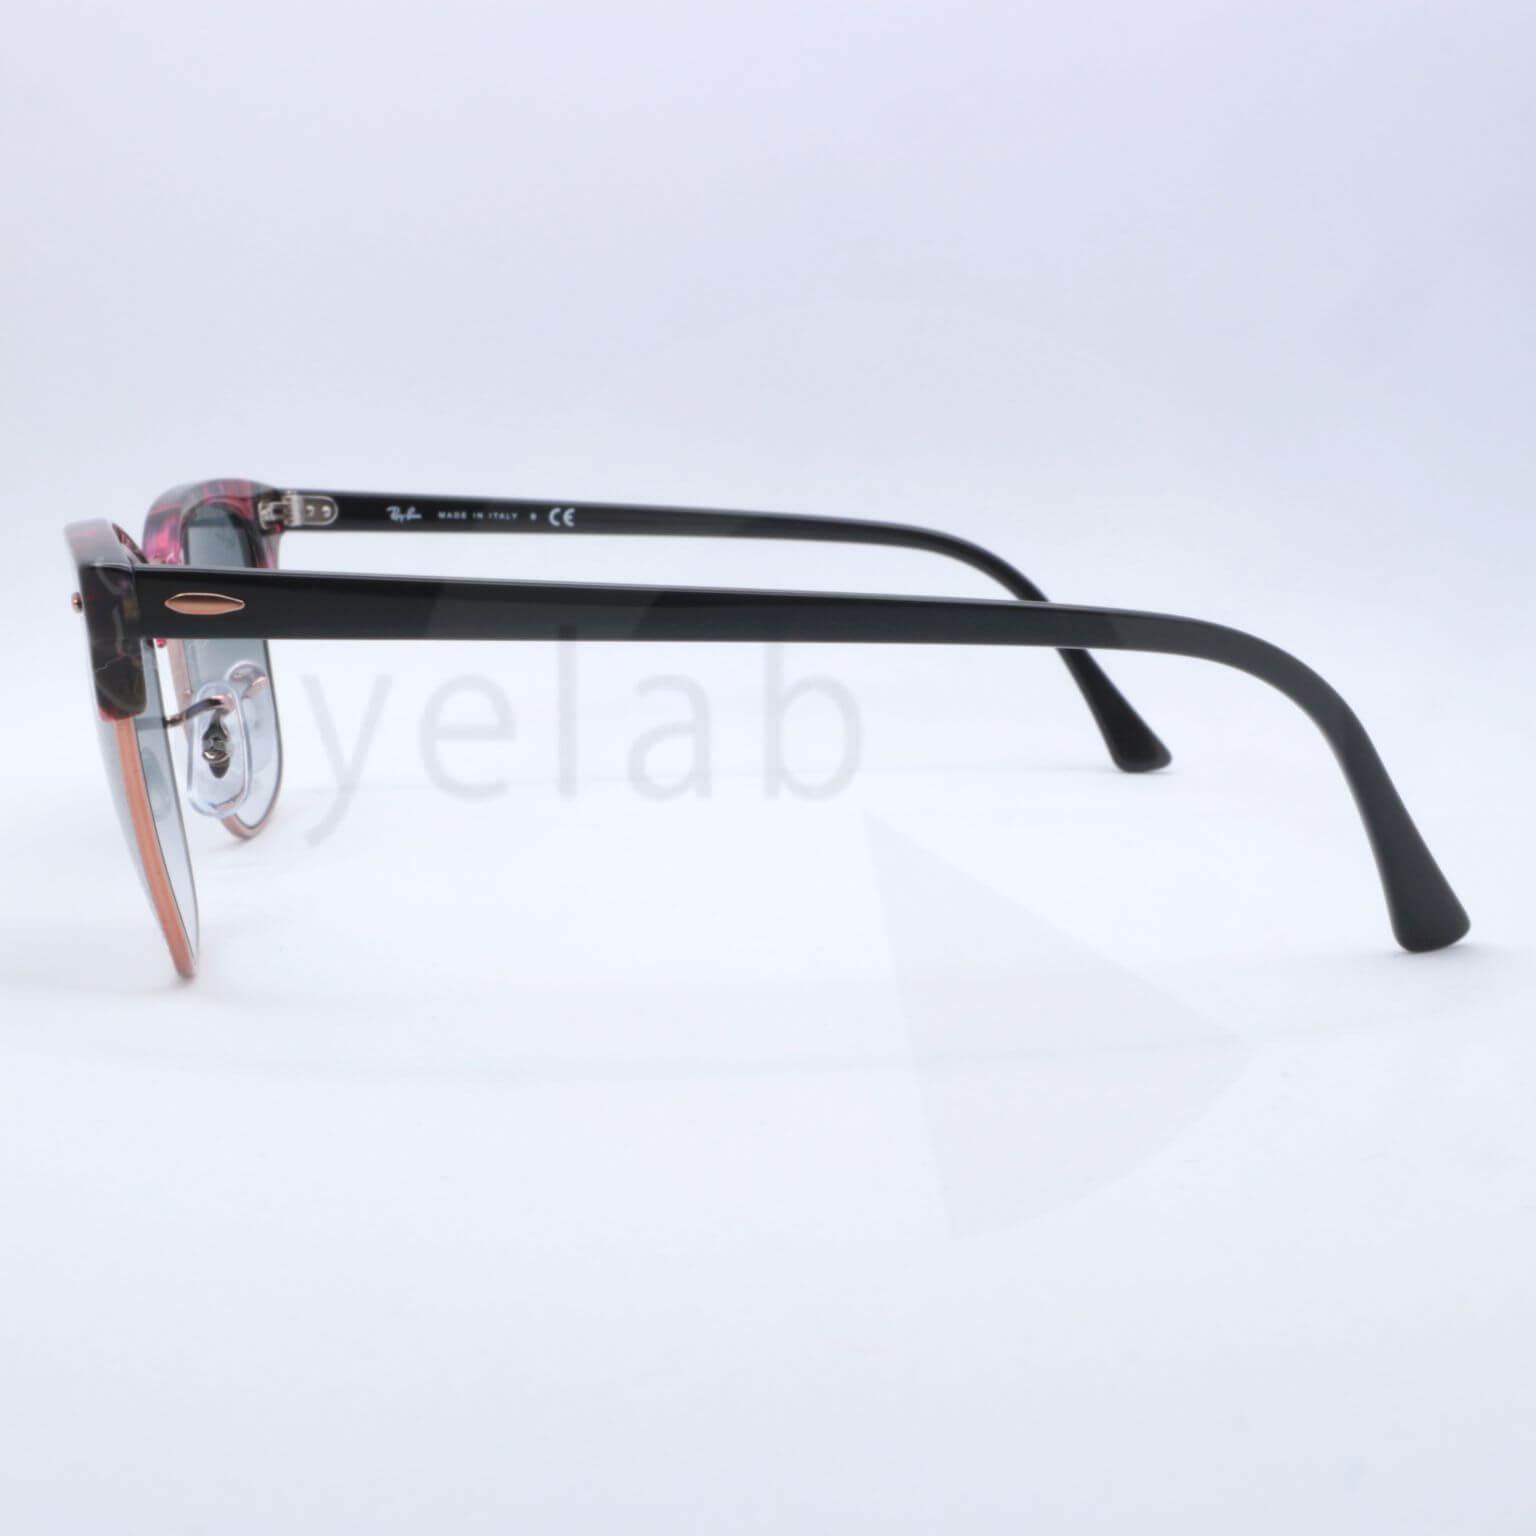 2438c09c45 Ray-Ban 3016 Clubmaster 12573F 51 sunglasses ~ Οπτικά Eyelab